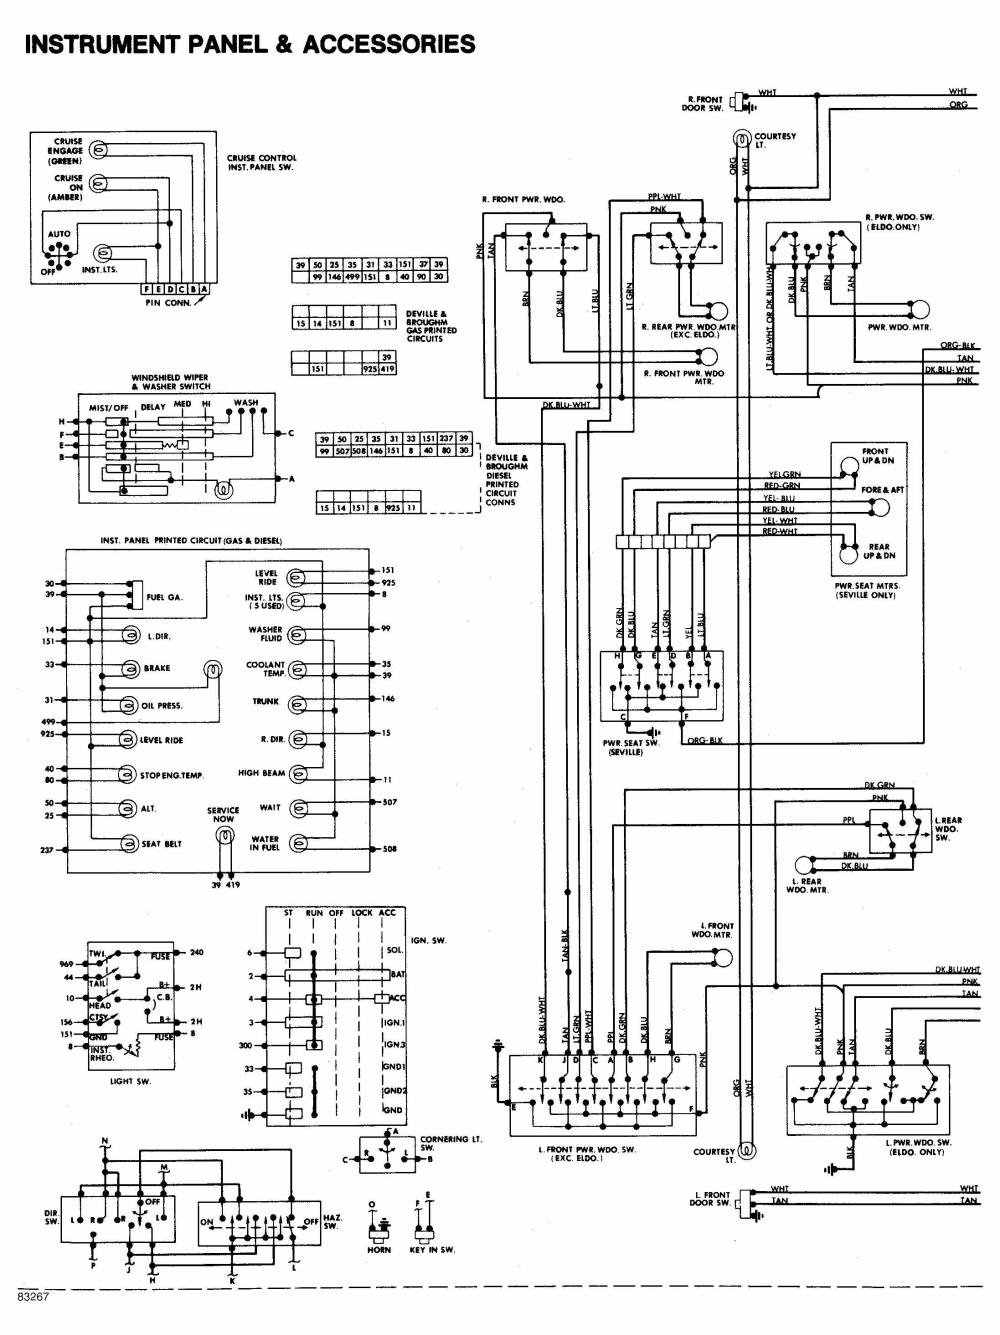 medium resolution of 2002 cadillac deville factory amp wiring diagram free wiring diagram rh ricardolevinsmorales com ford 351w distributor wiring 76 cordoba distributor wiring